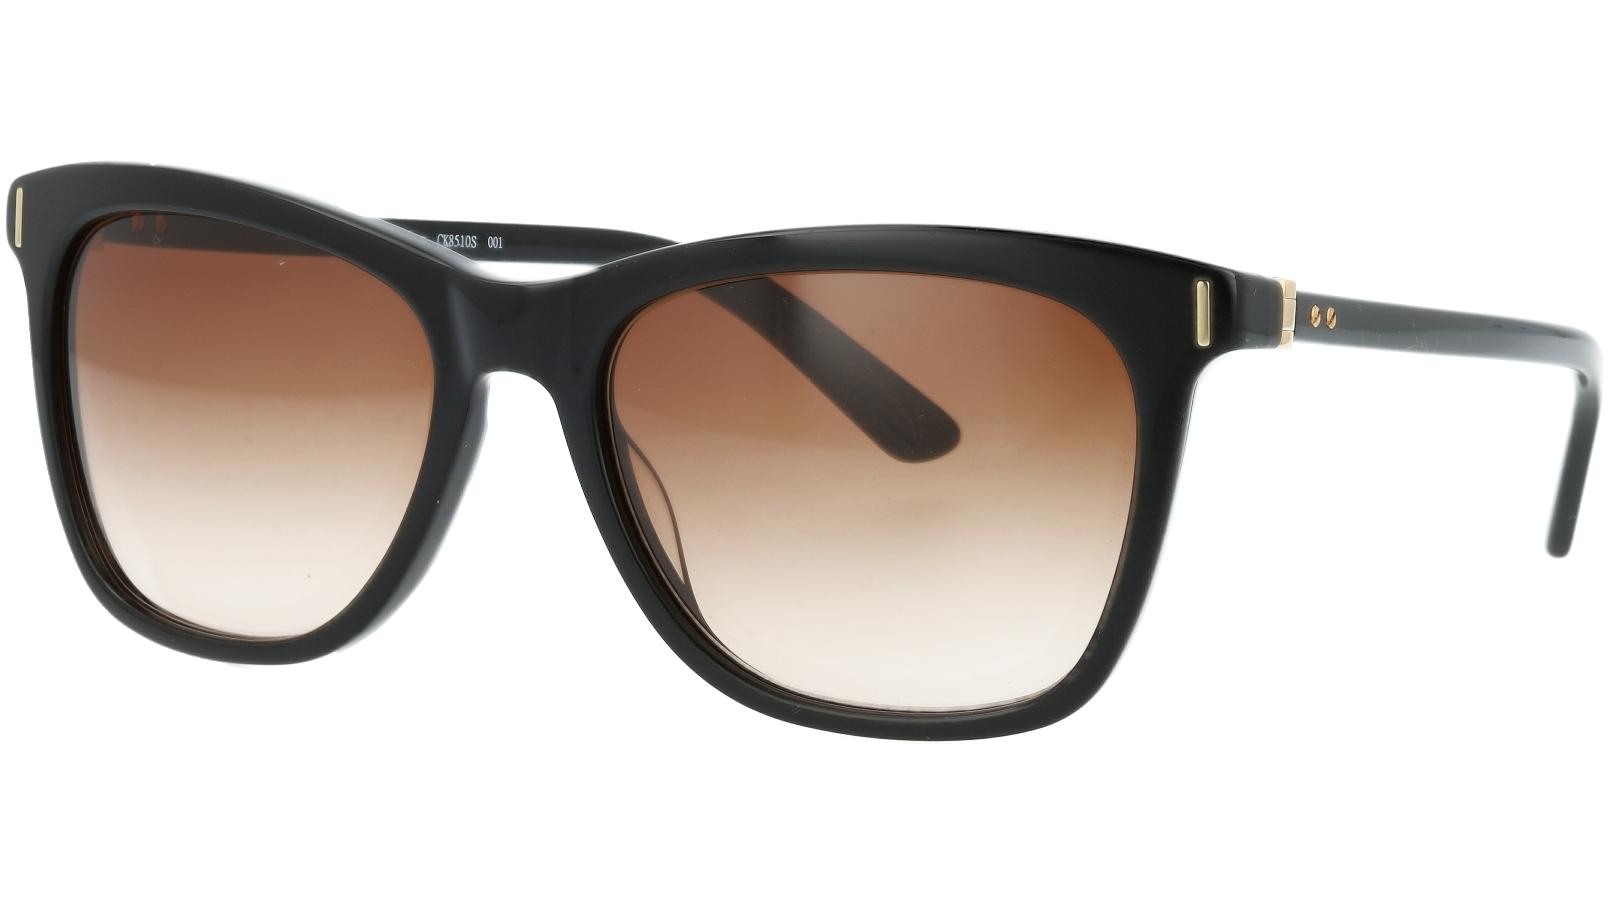 Calvin Klein CK8510S 218 55 Tortoises Sunglasses